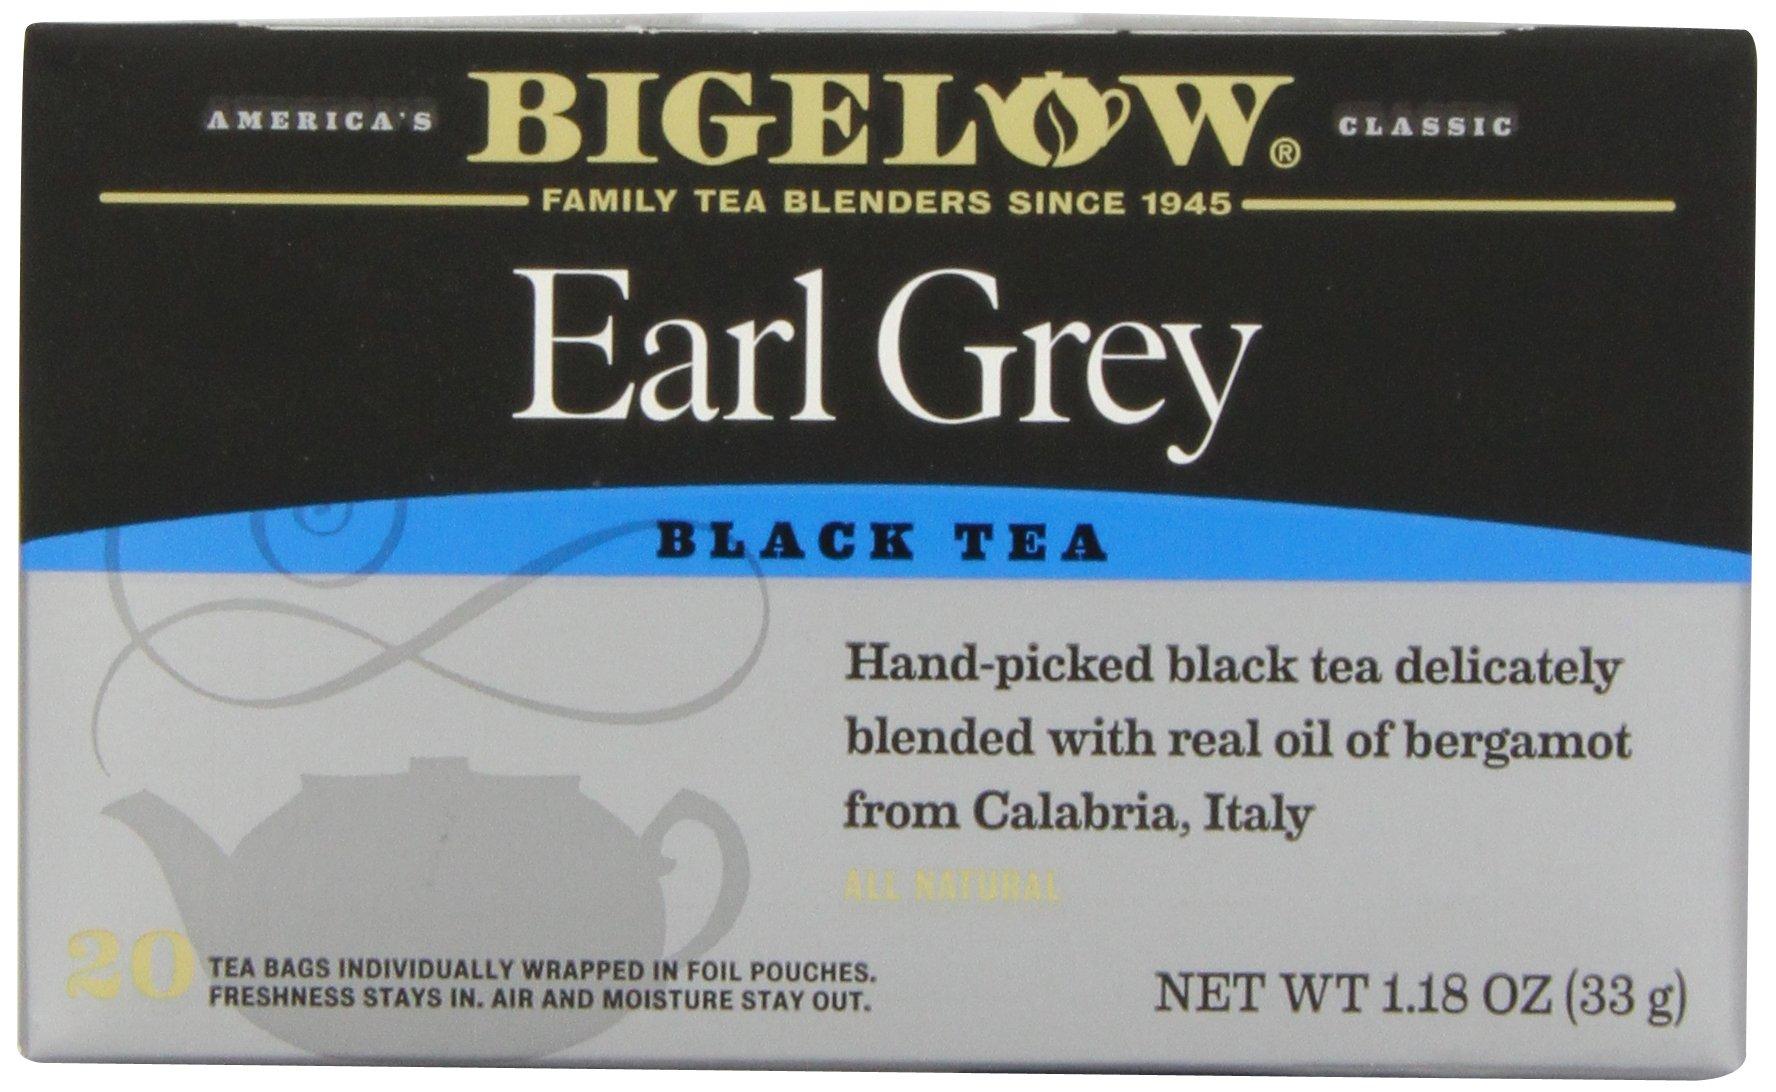 Bigelow Earl Grey Tea, 20 ct